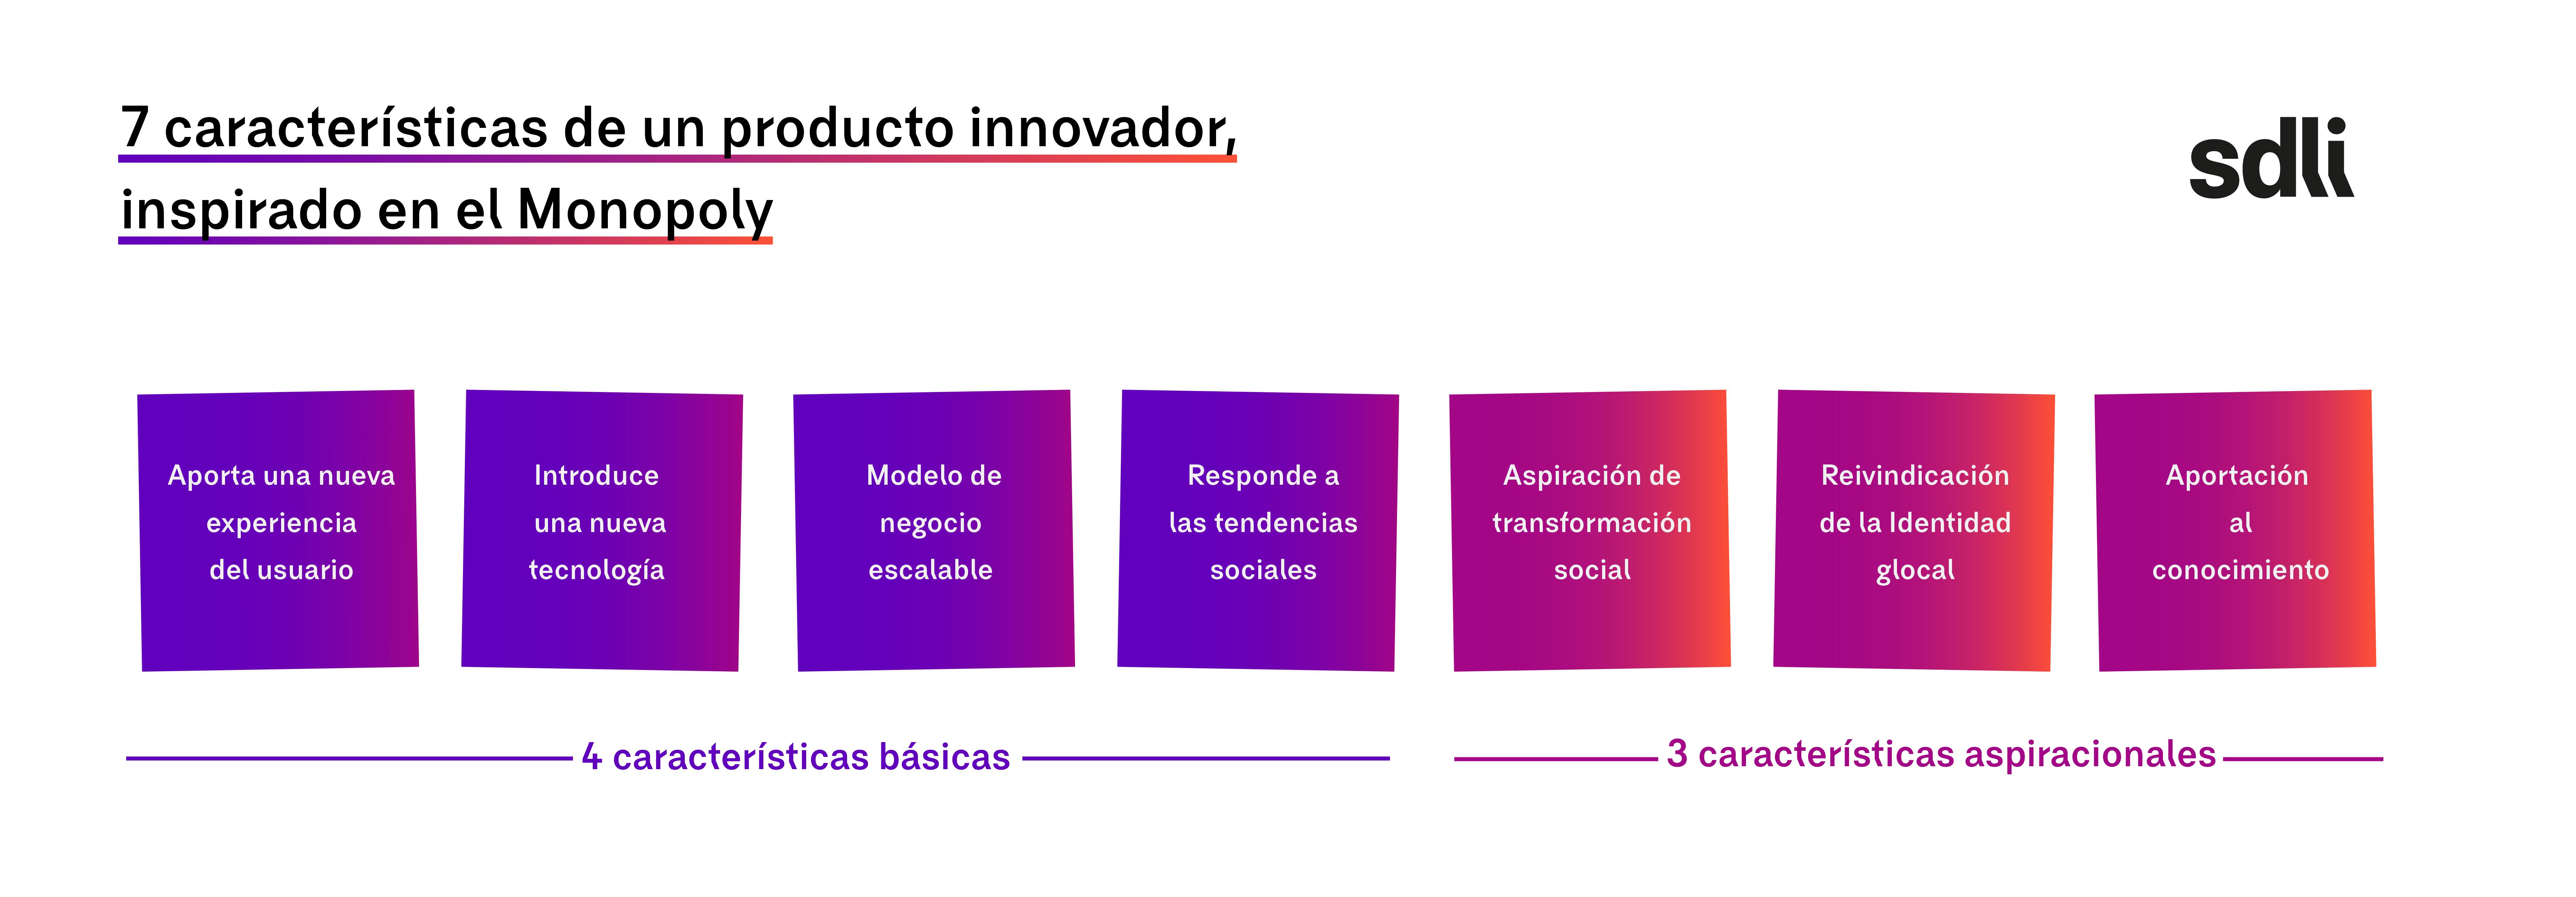 7 características de un producto innovador